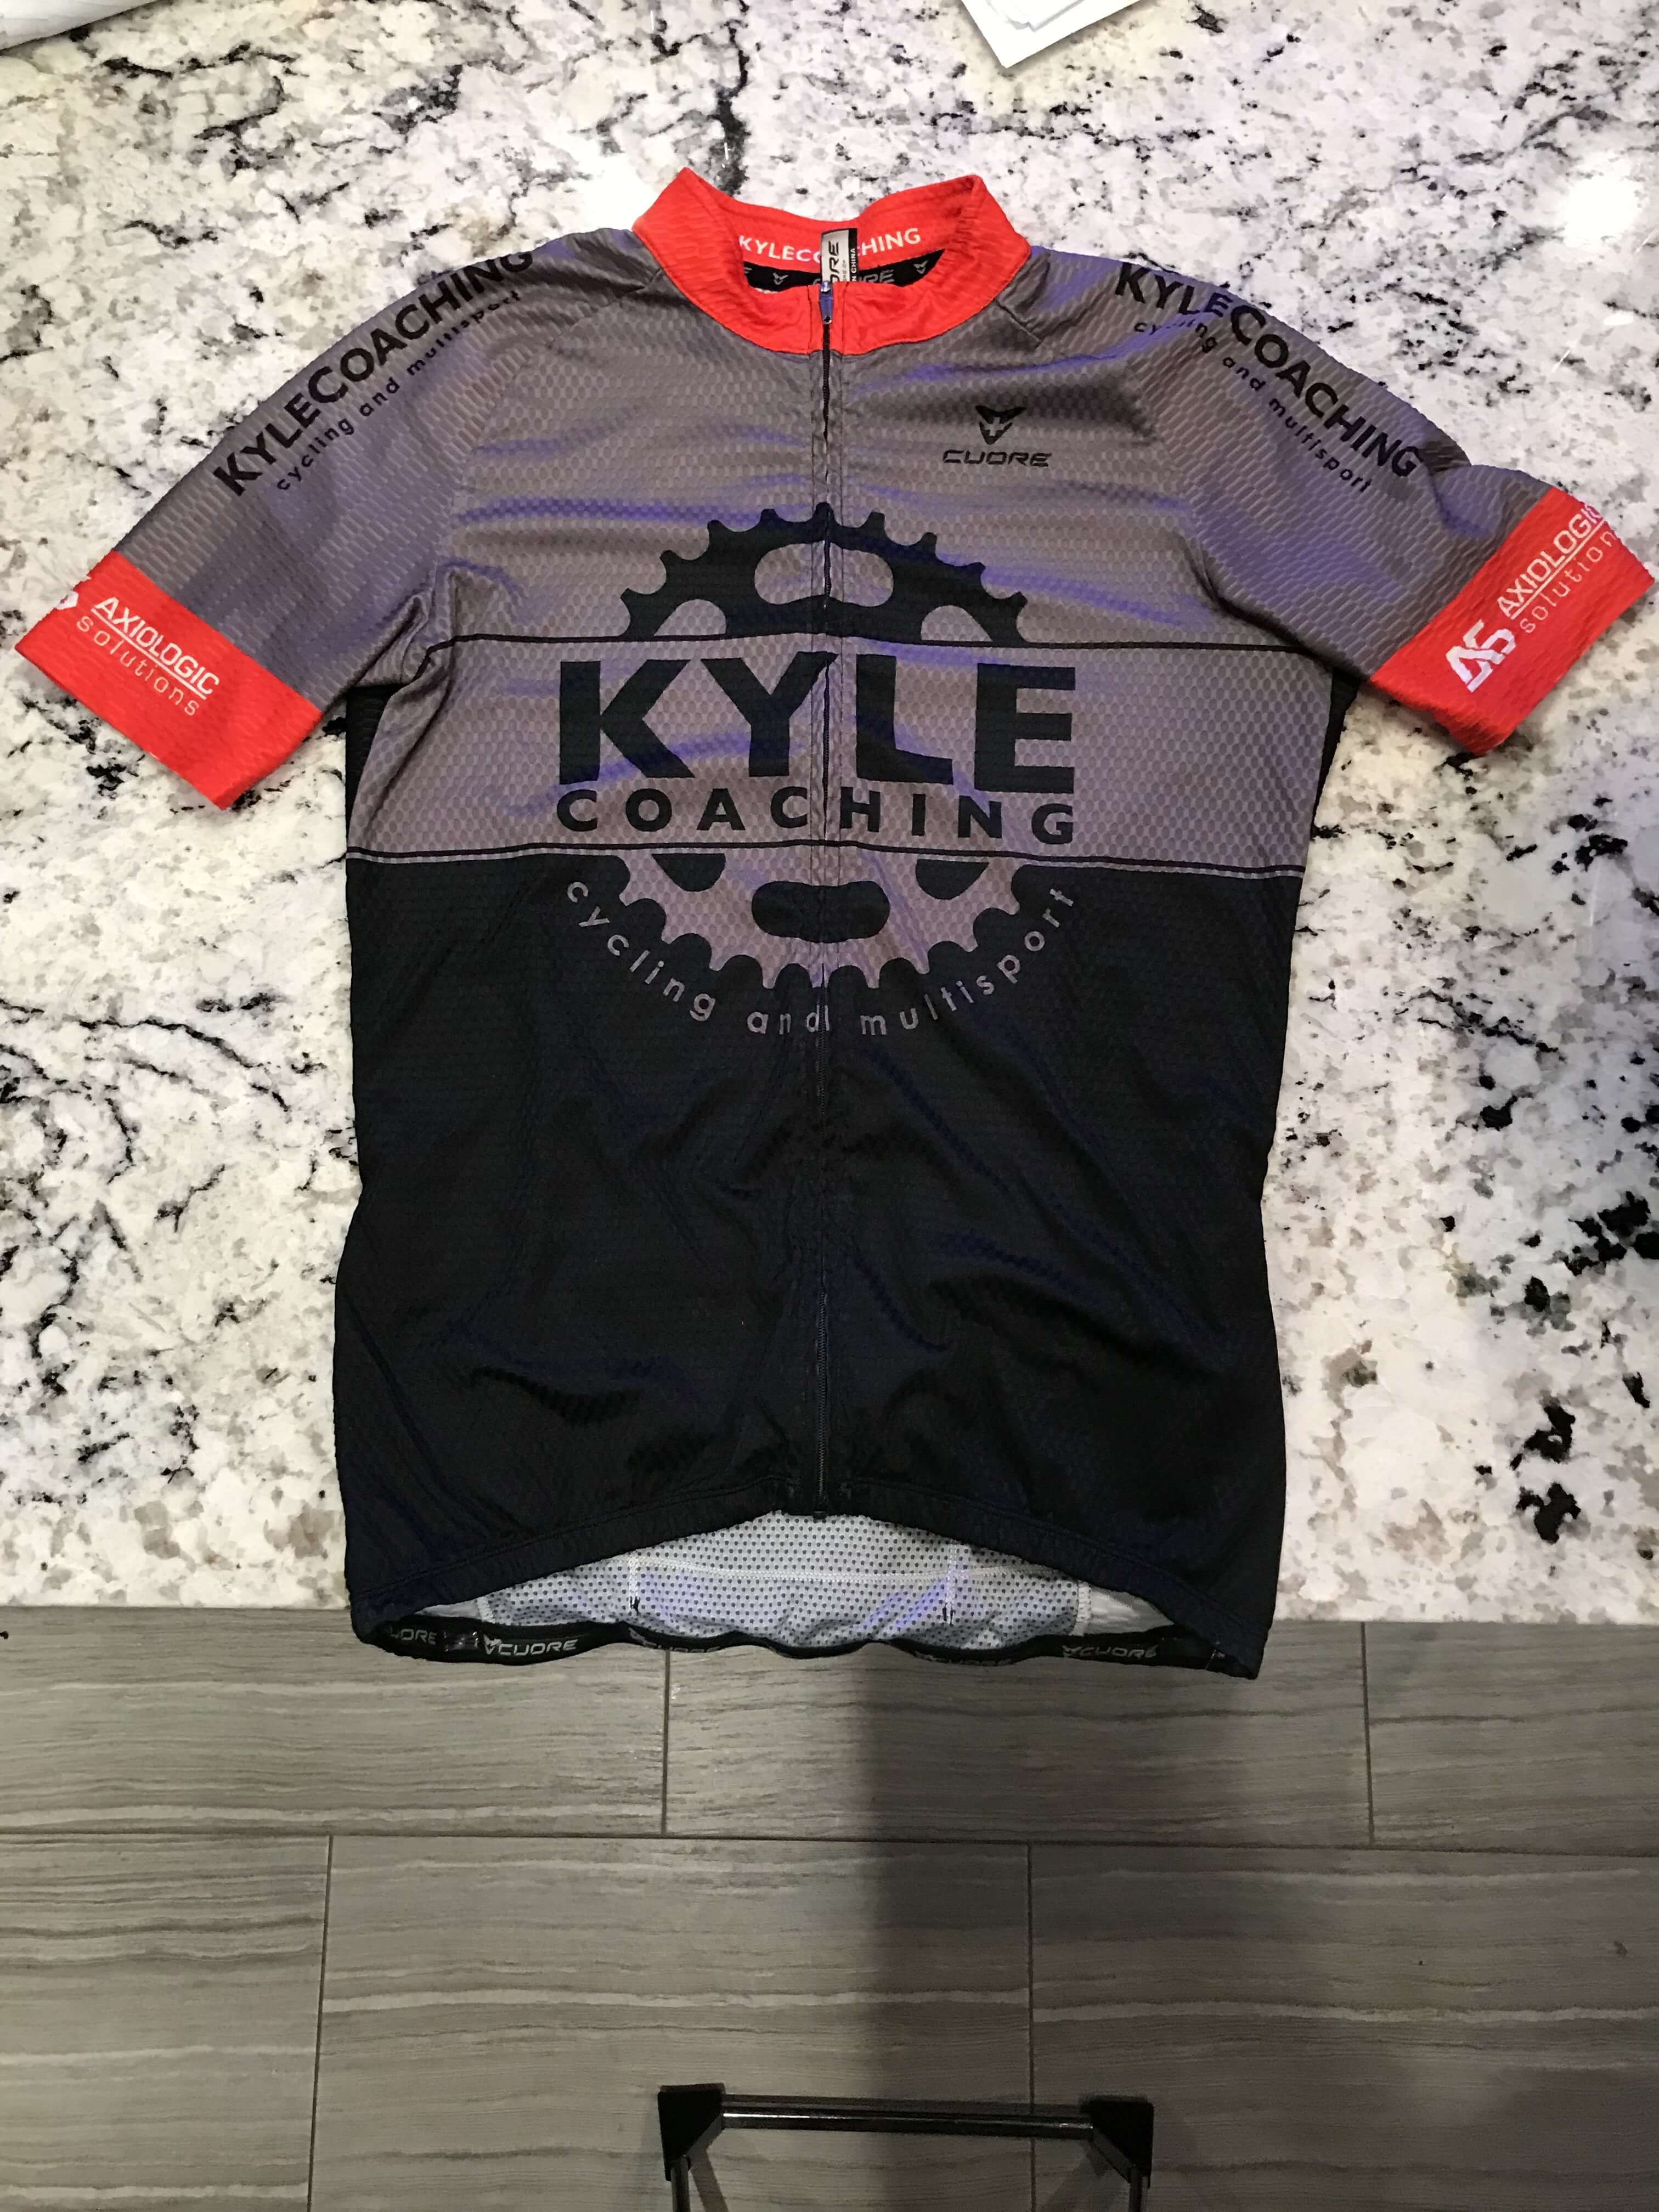 Cuore Silver Men Cycling S Sleeve Race Jersey - KyleCoaching 3c7355411